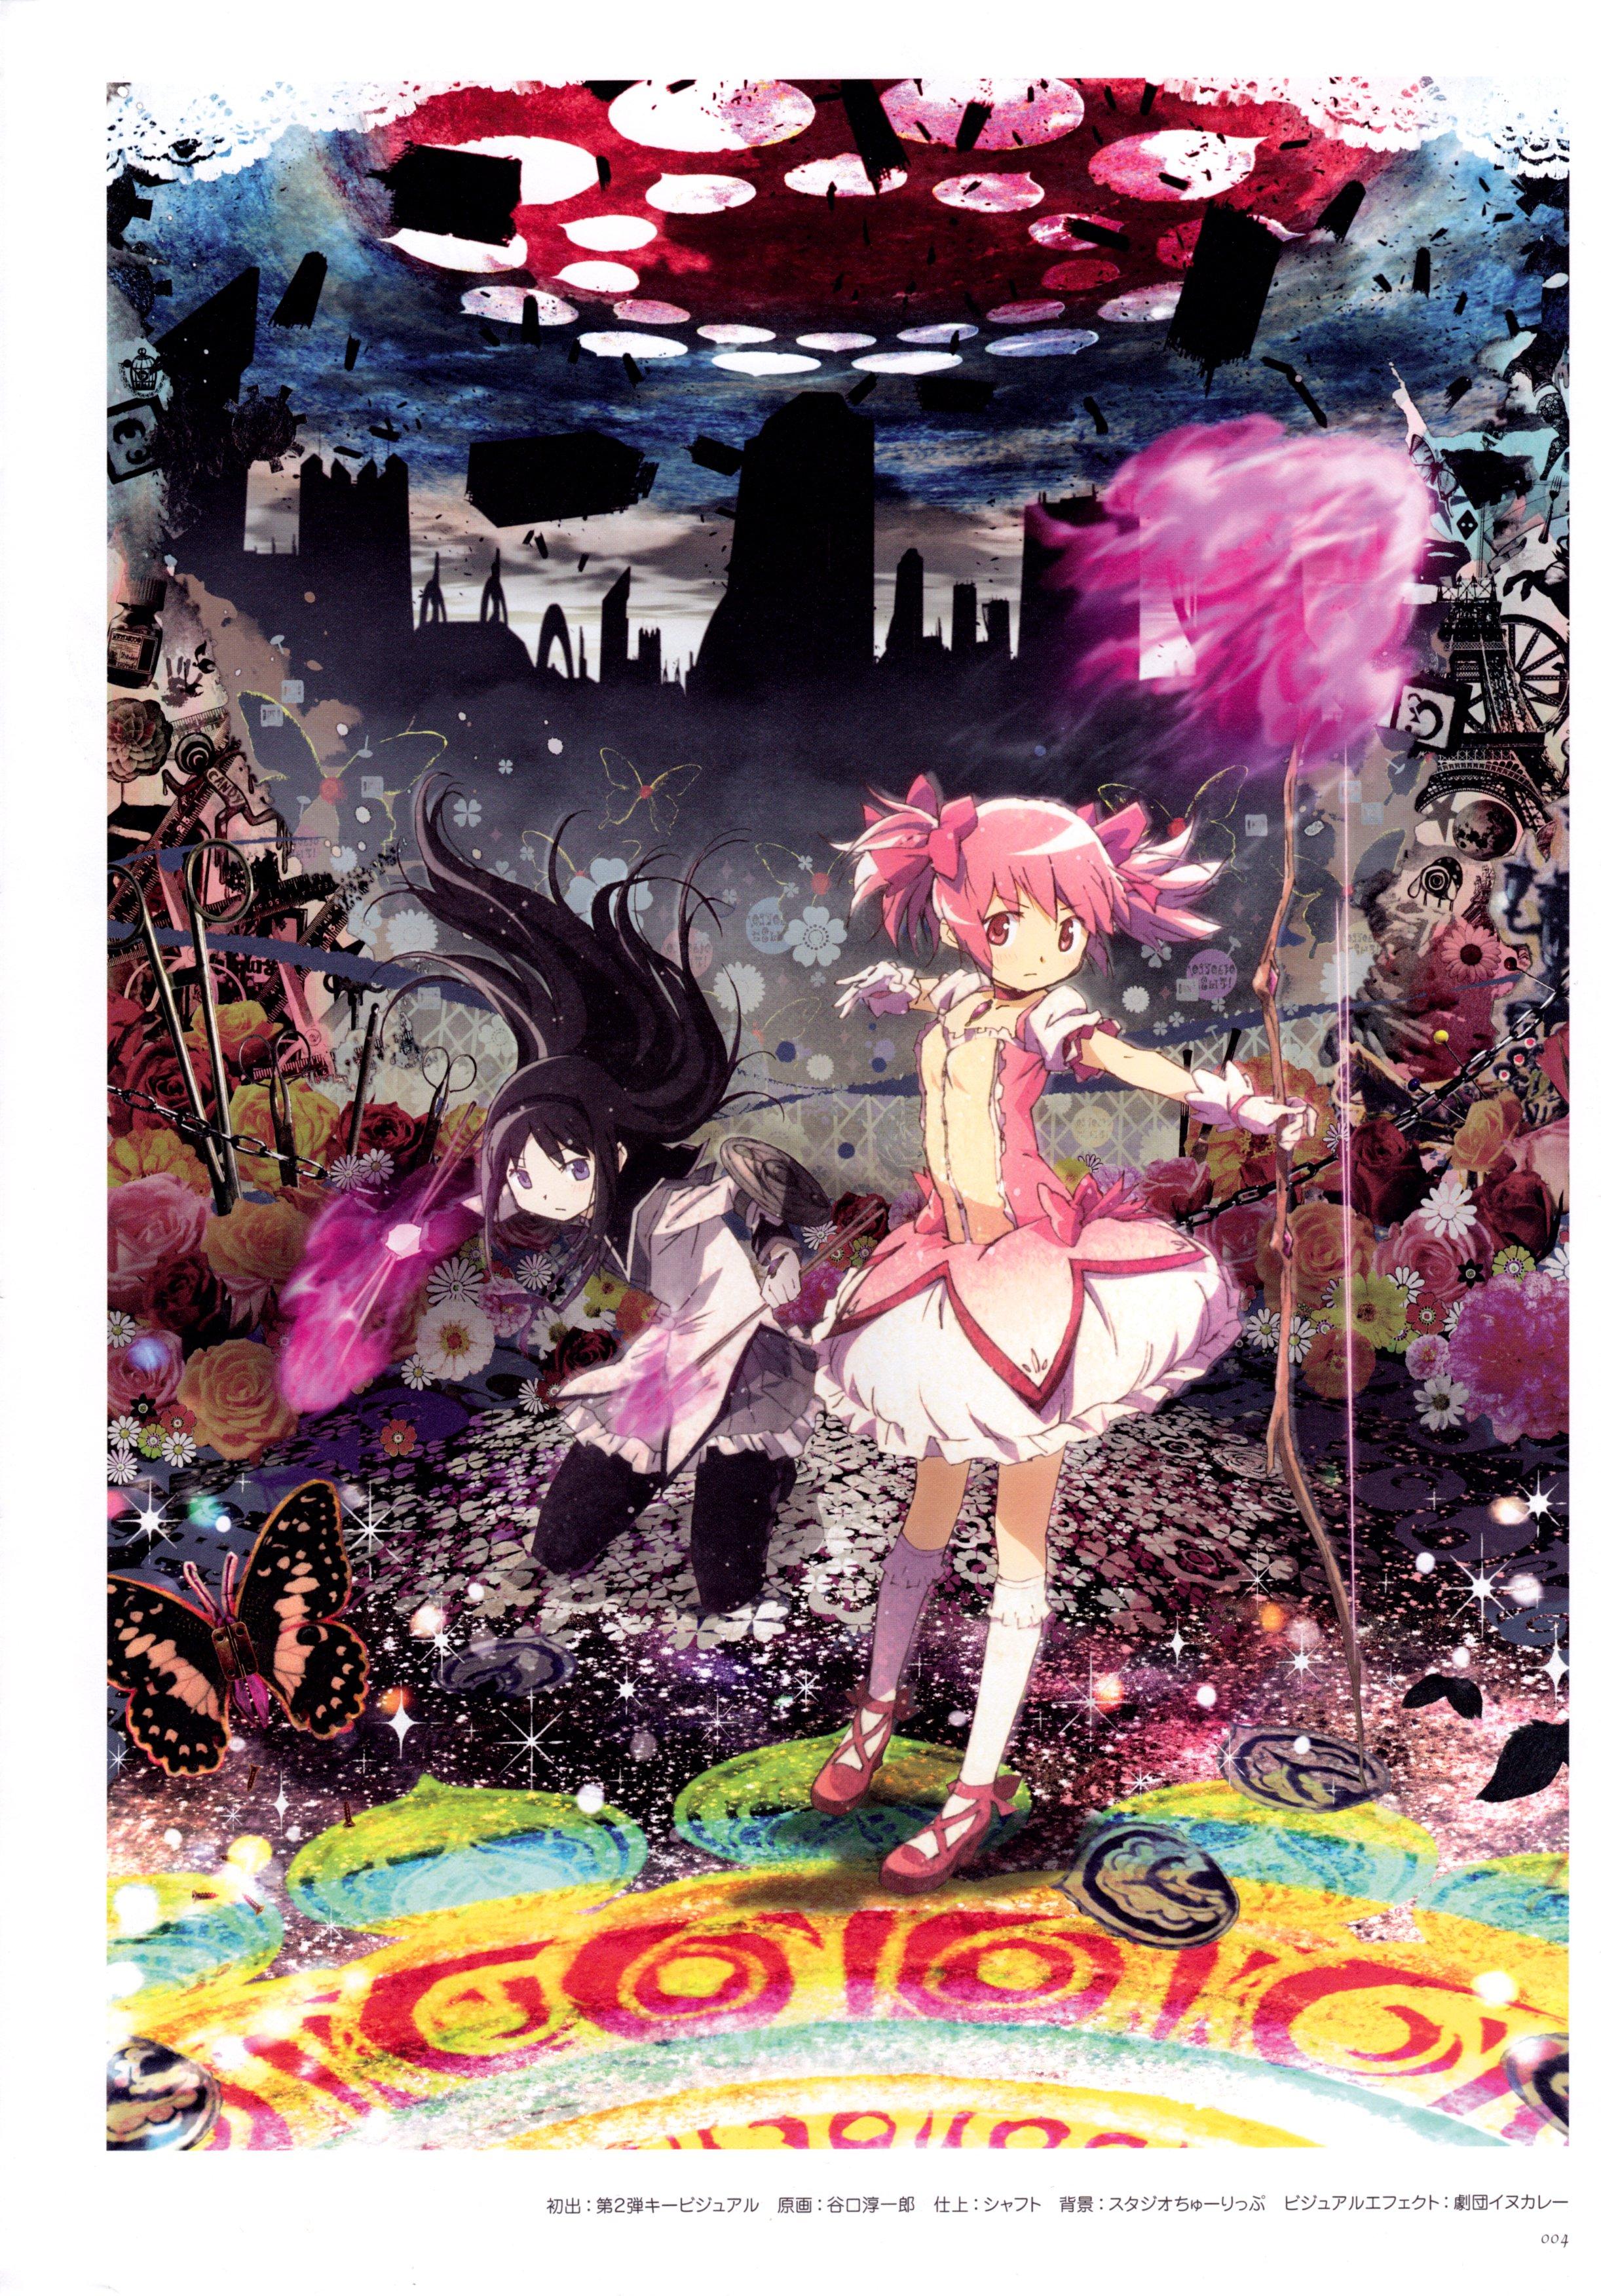 Homura Akemi Wallpaper And Scan Gallery Minitokyo